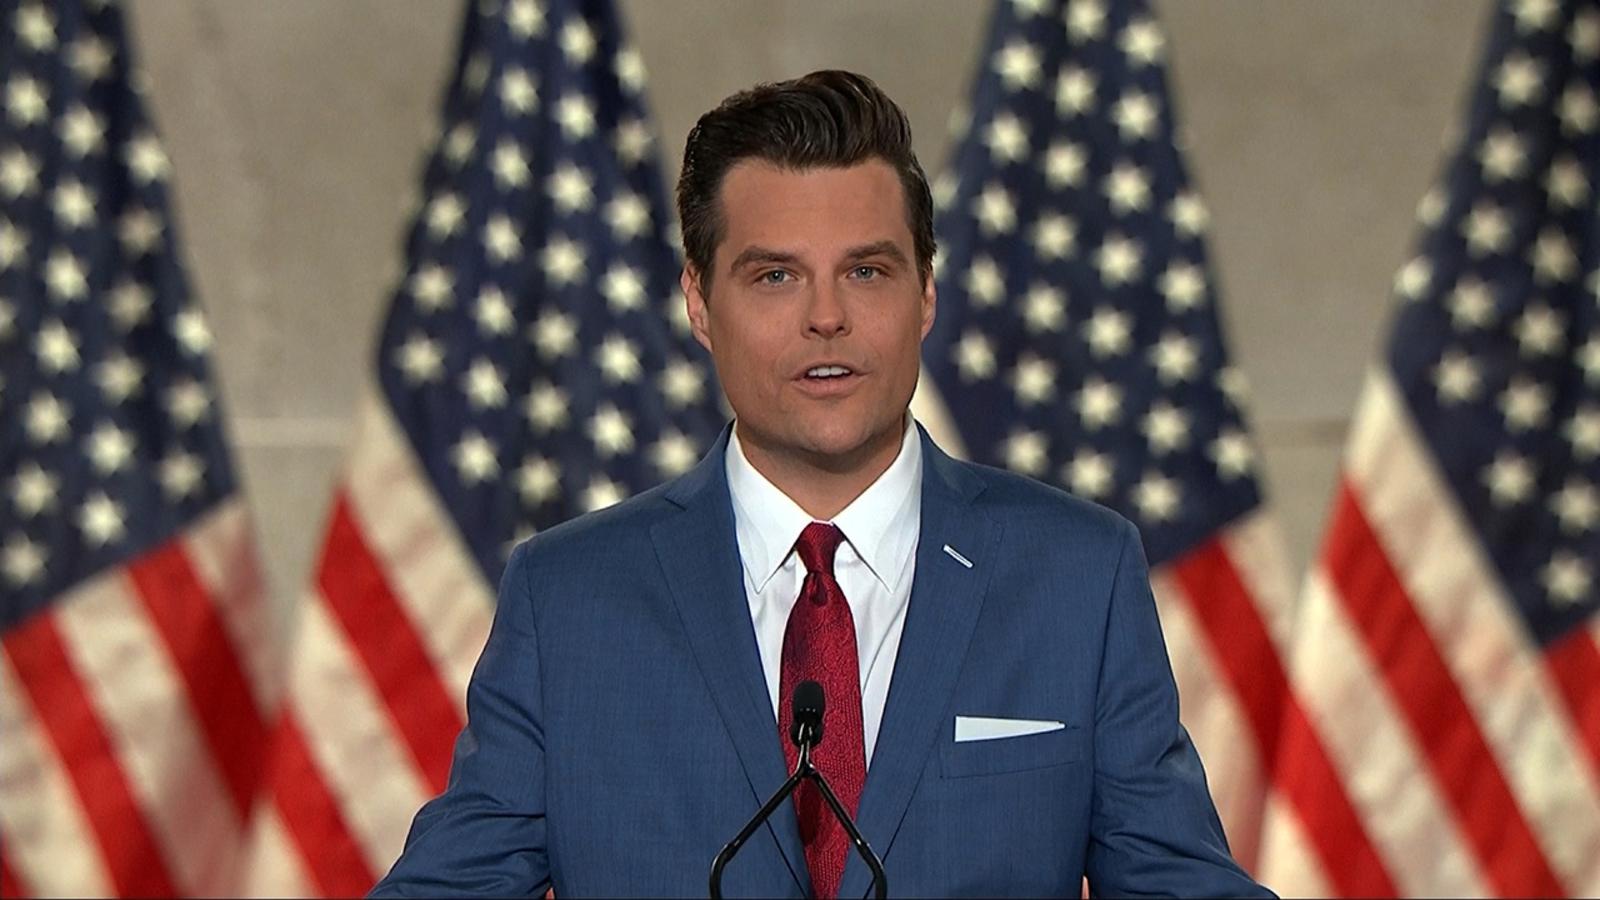 Few in GOP rush to defend Rep. Matt Gaetz amid sex trafficking probe - ABC7  Chicago